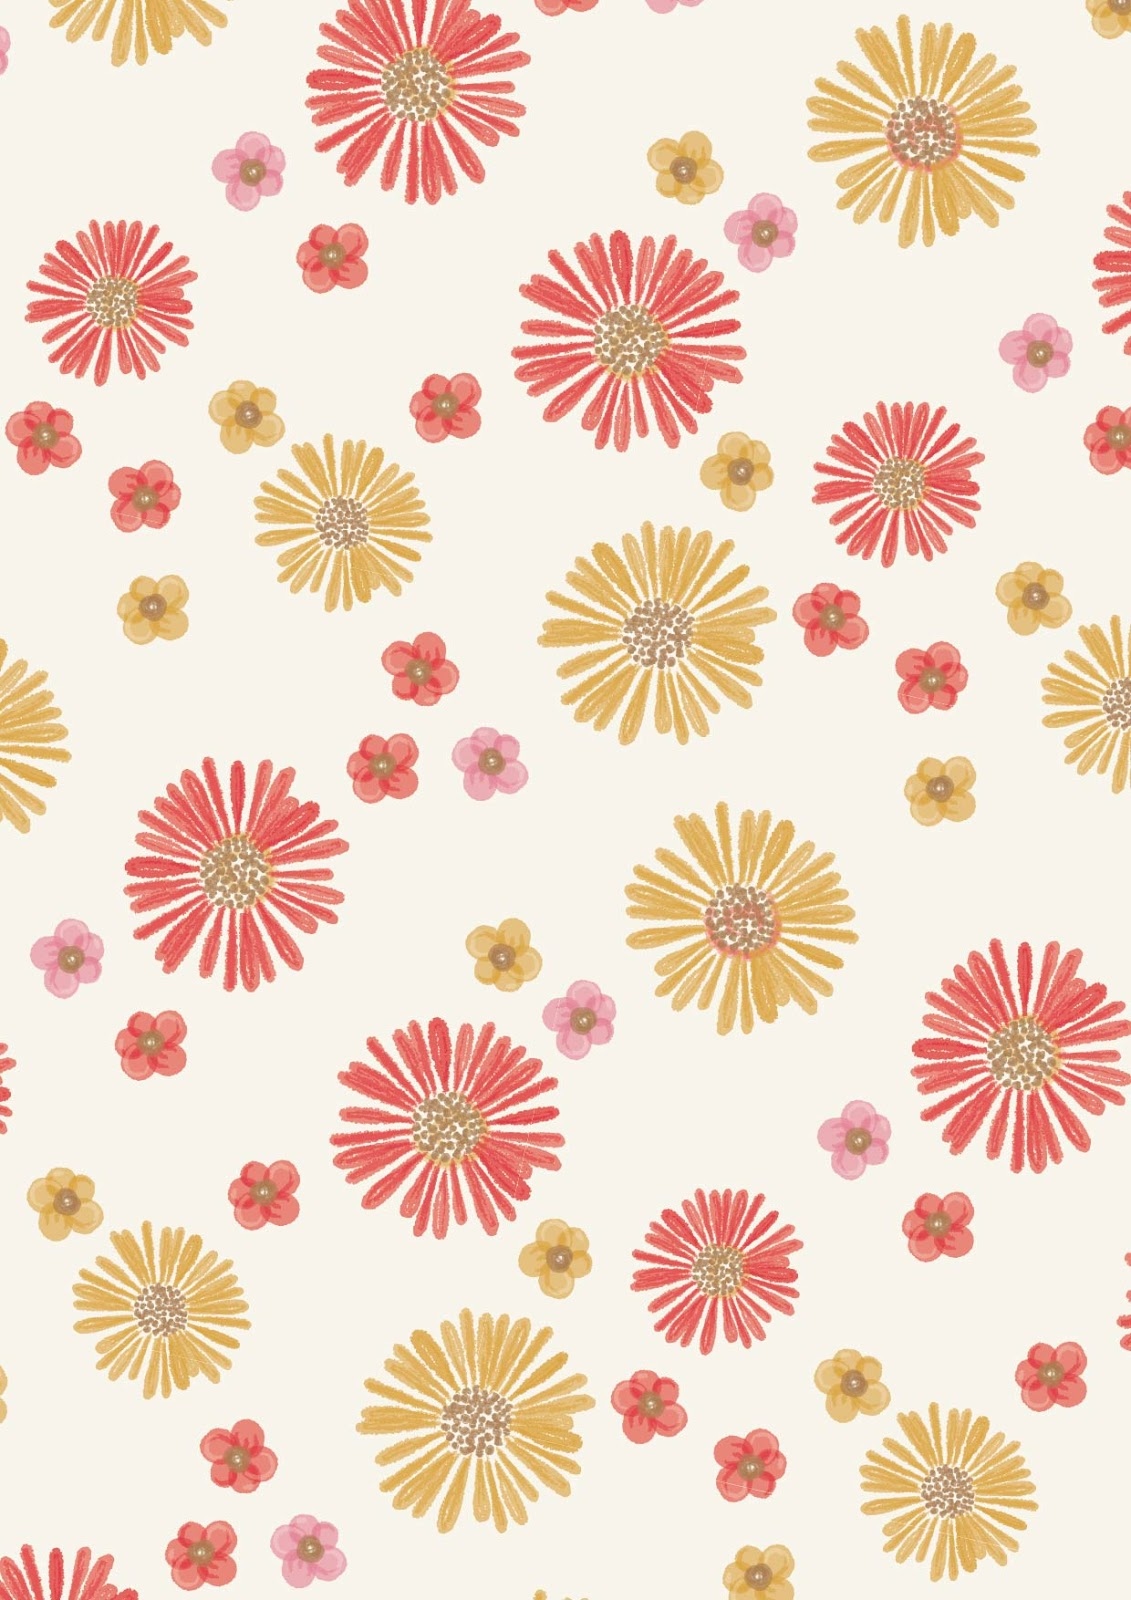 floral prints kiddy flower emily patterns